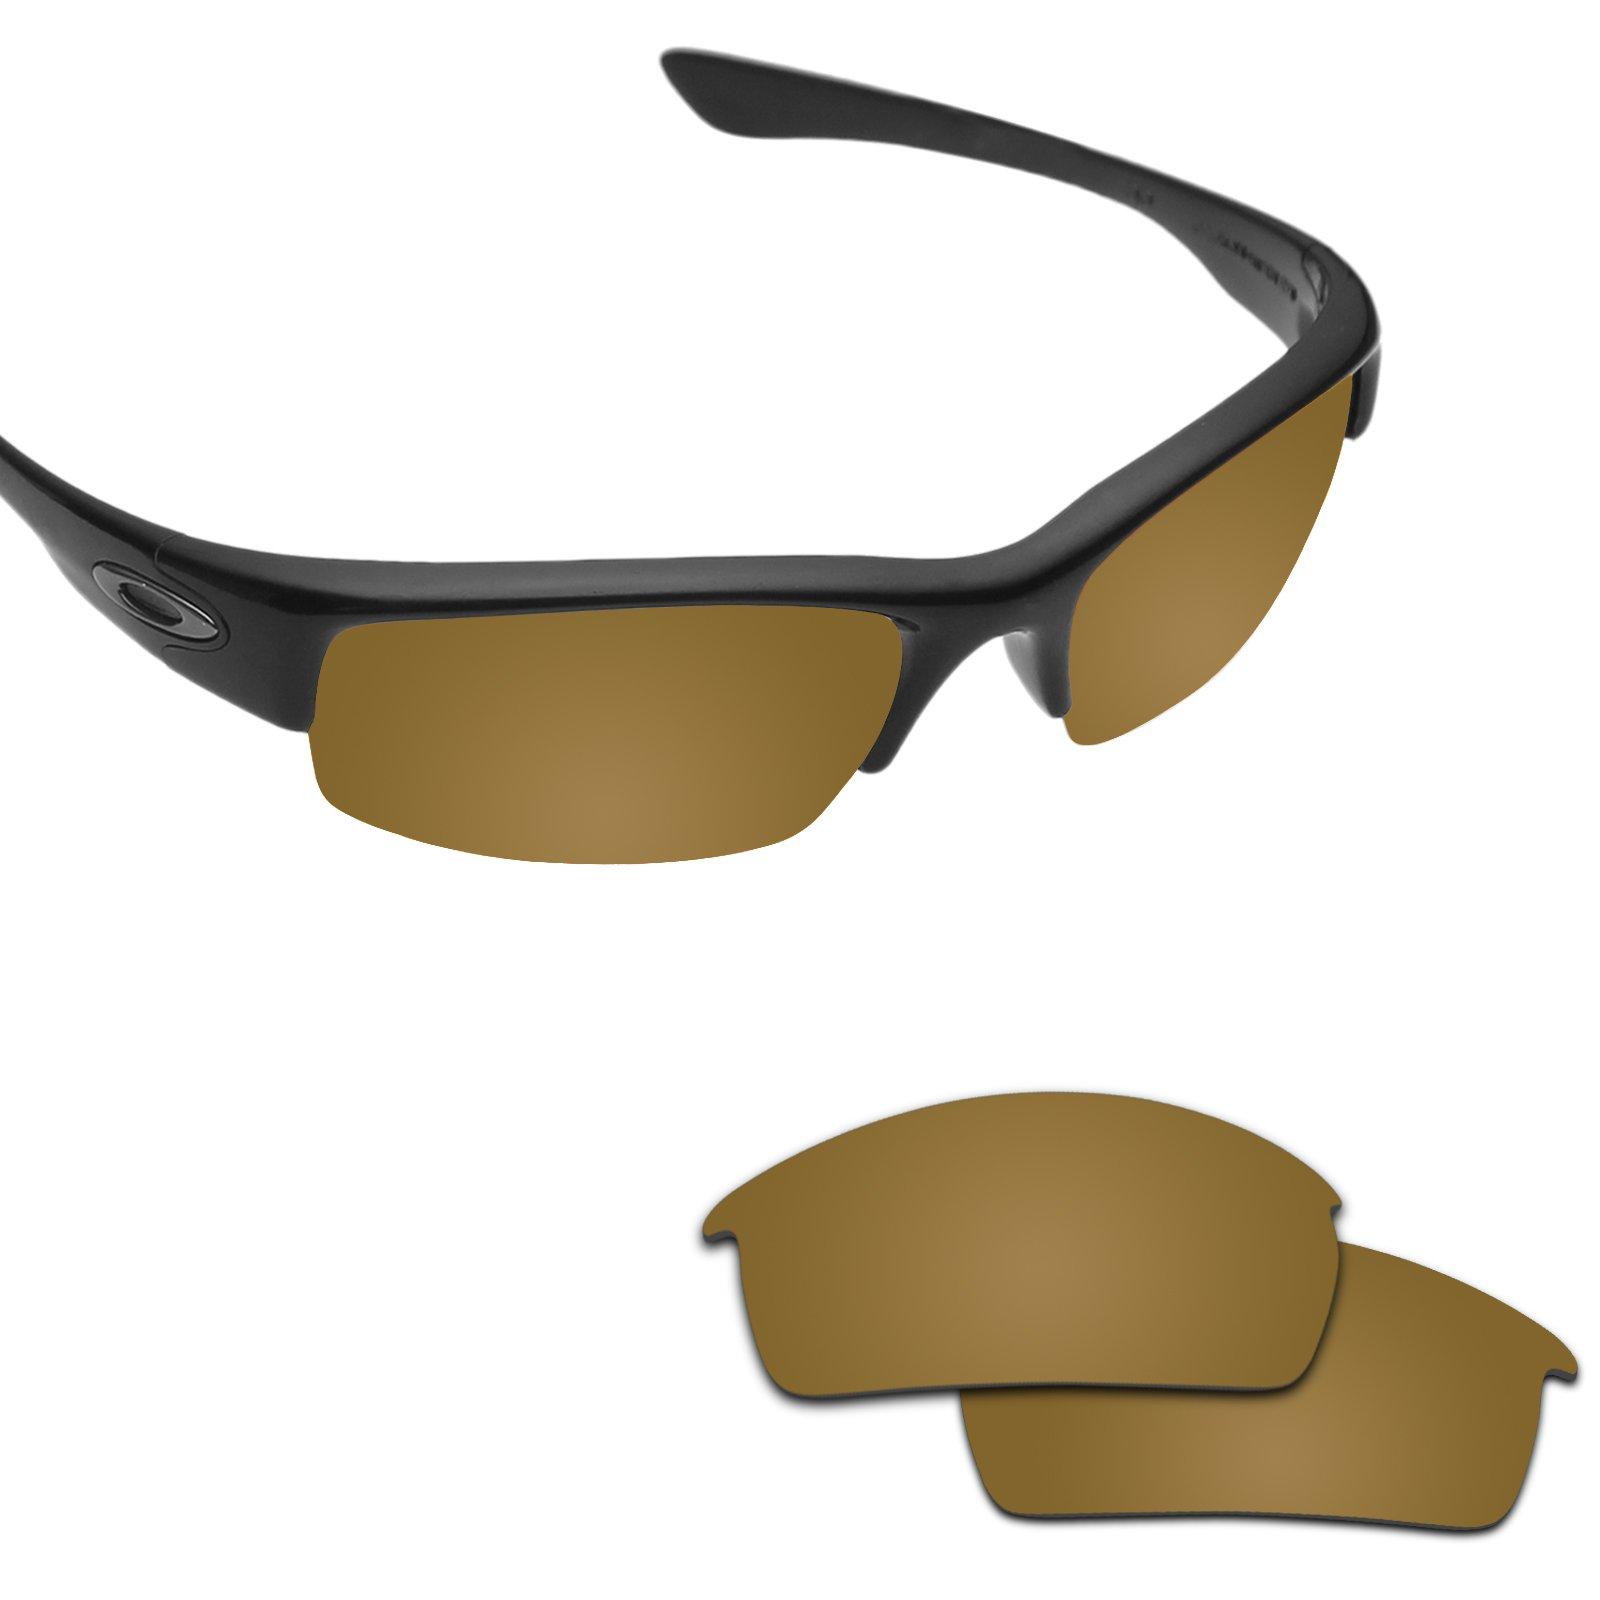 Fiskr Anti-saltwater Polarized Replacement Lenses for Oakley Bottlecap Sunglasses - Various Colors (Bronze Gold - Anti4s Mirror Polarized, 0)